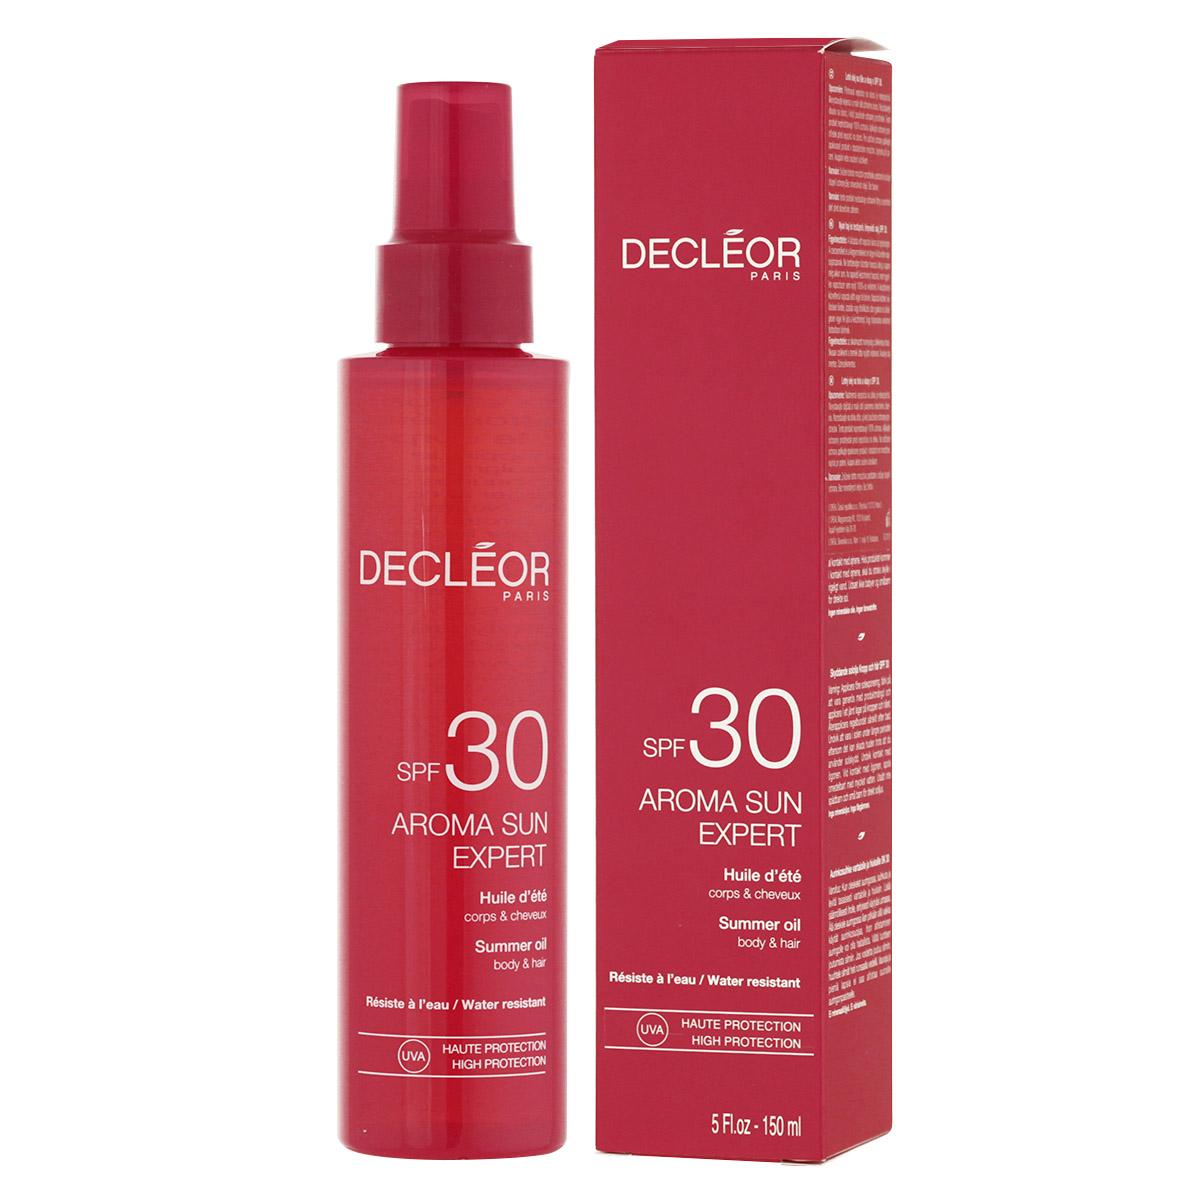 Decléor Aroma Sun Expert Summer Oil Body & Hair SPF 30 150 ml 90900